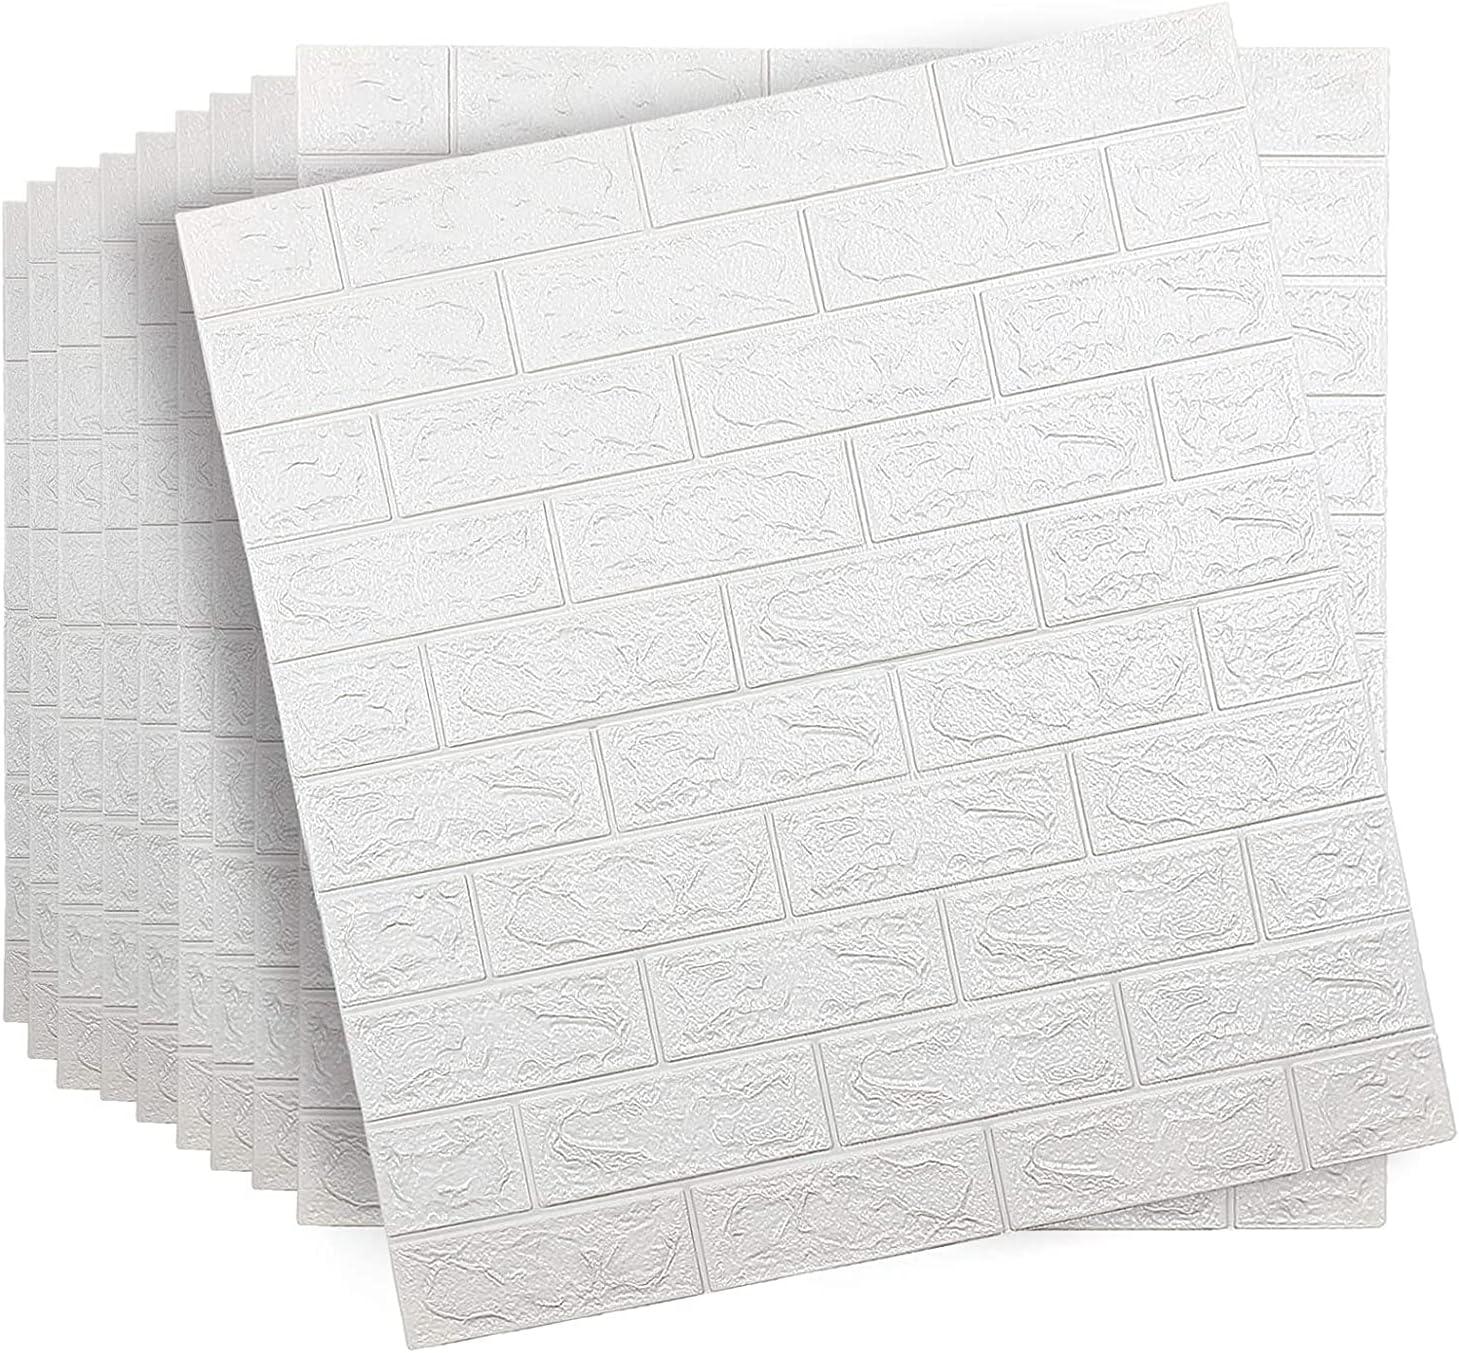 Super intense Philadelphia Mall SALE SHUKOES 10 Pcs 3D Self 77×70cm Wall Adhesive Tiles Brick